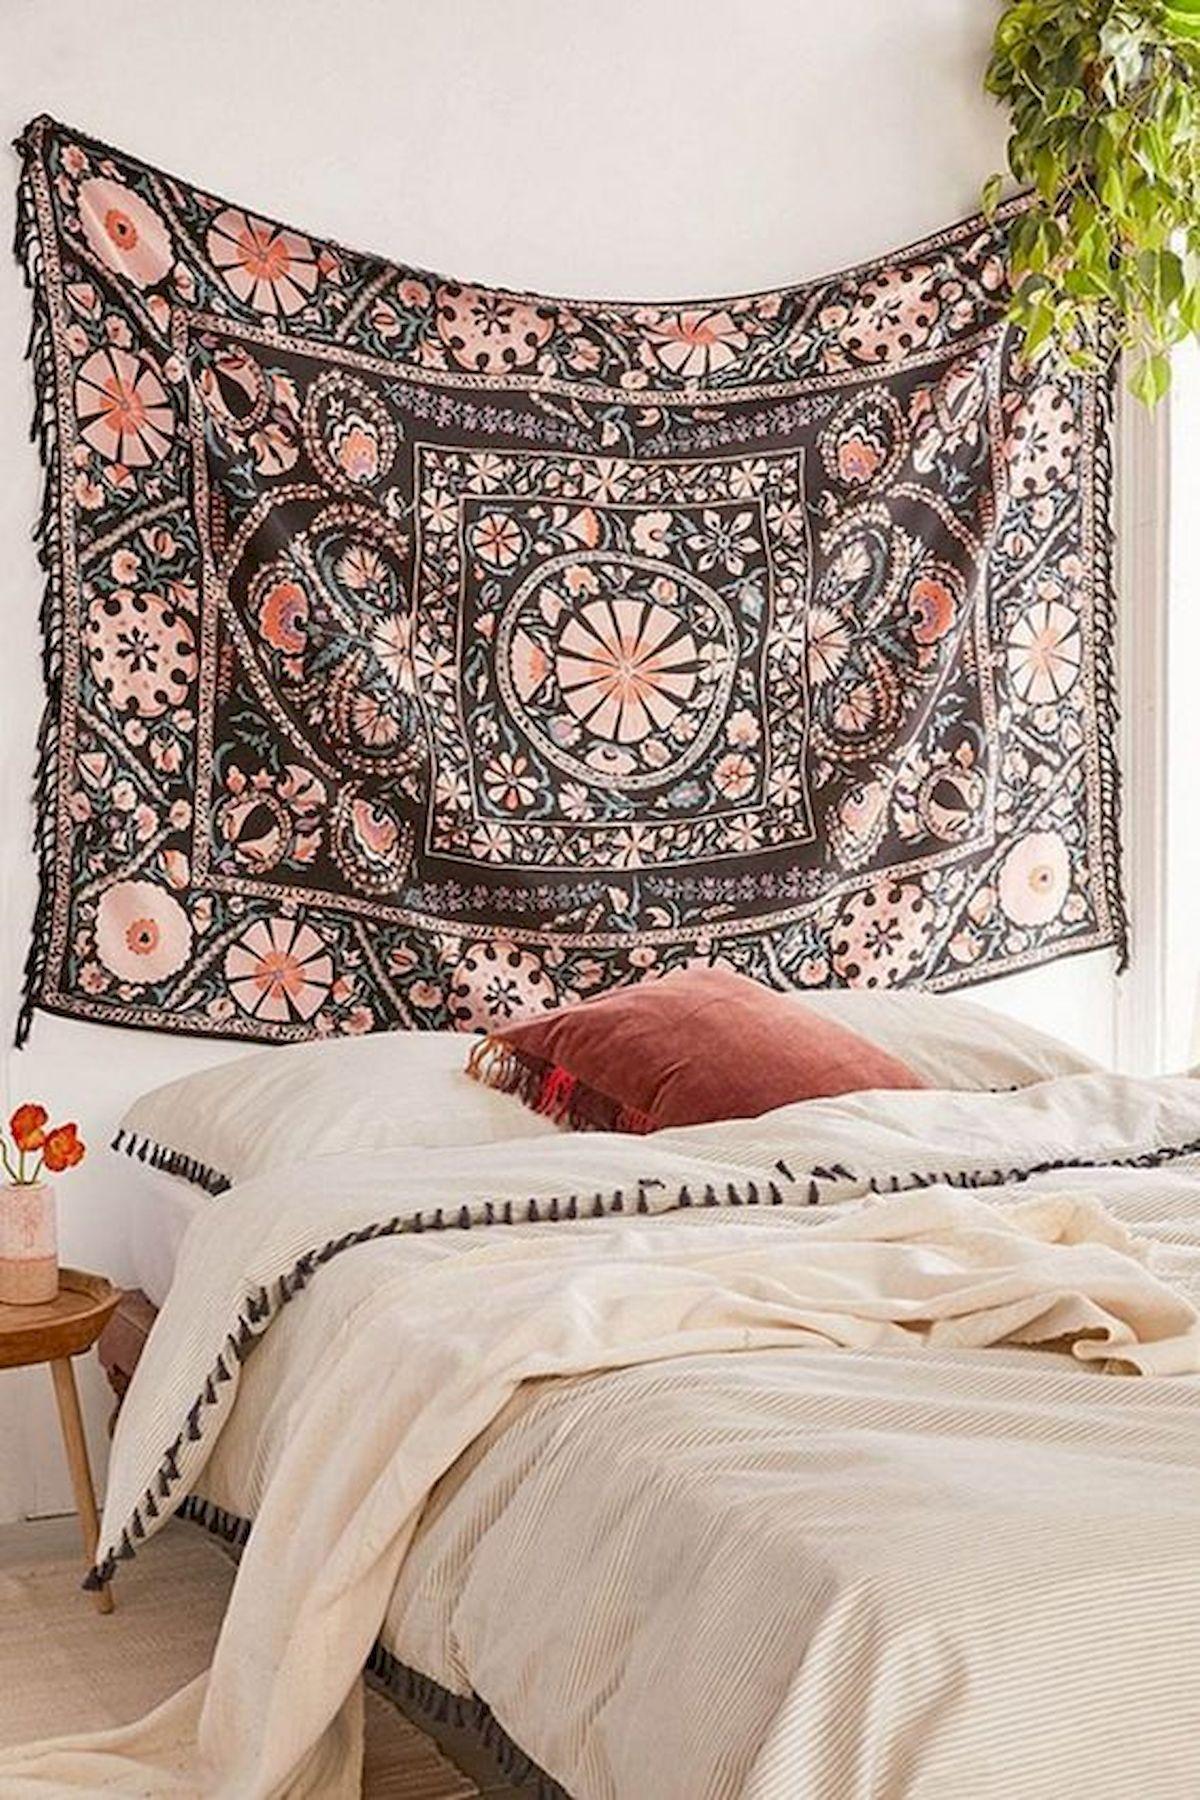 40 Amazing Farmhouse Boho Bedroom Design And Decor Ideas (2)